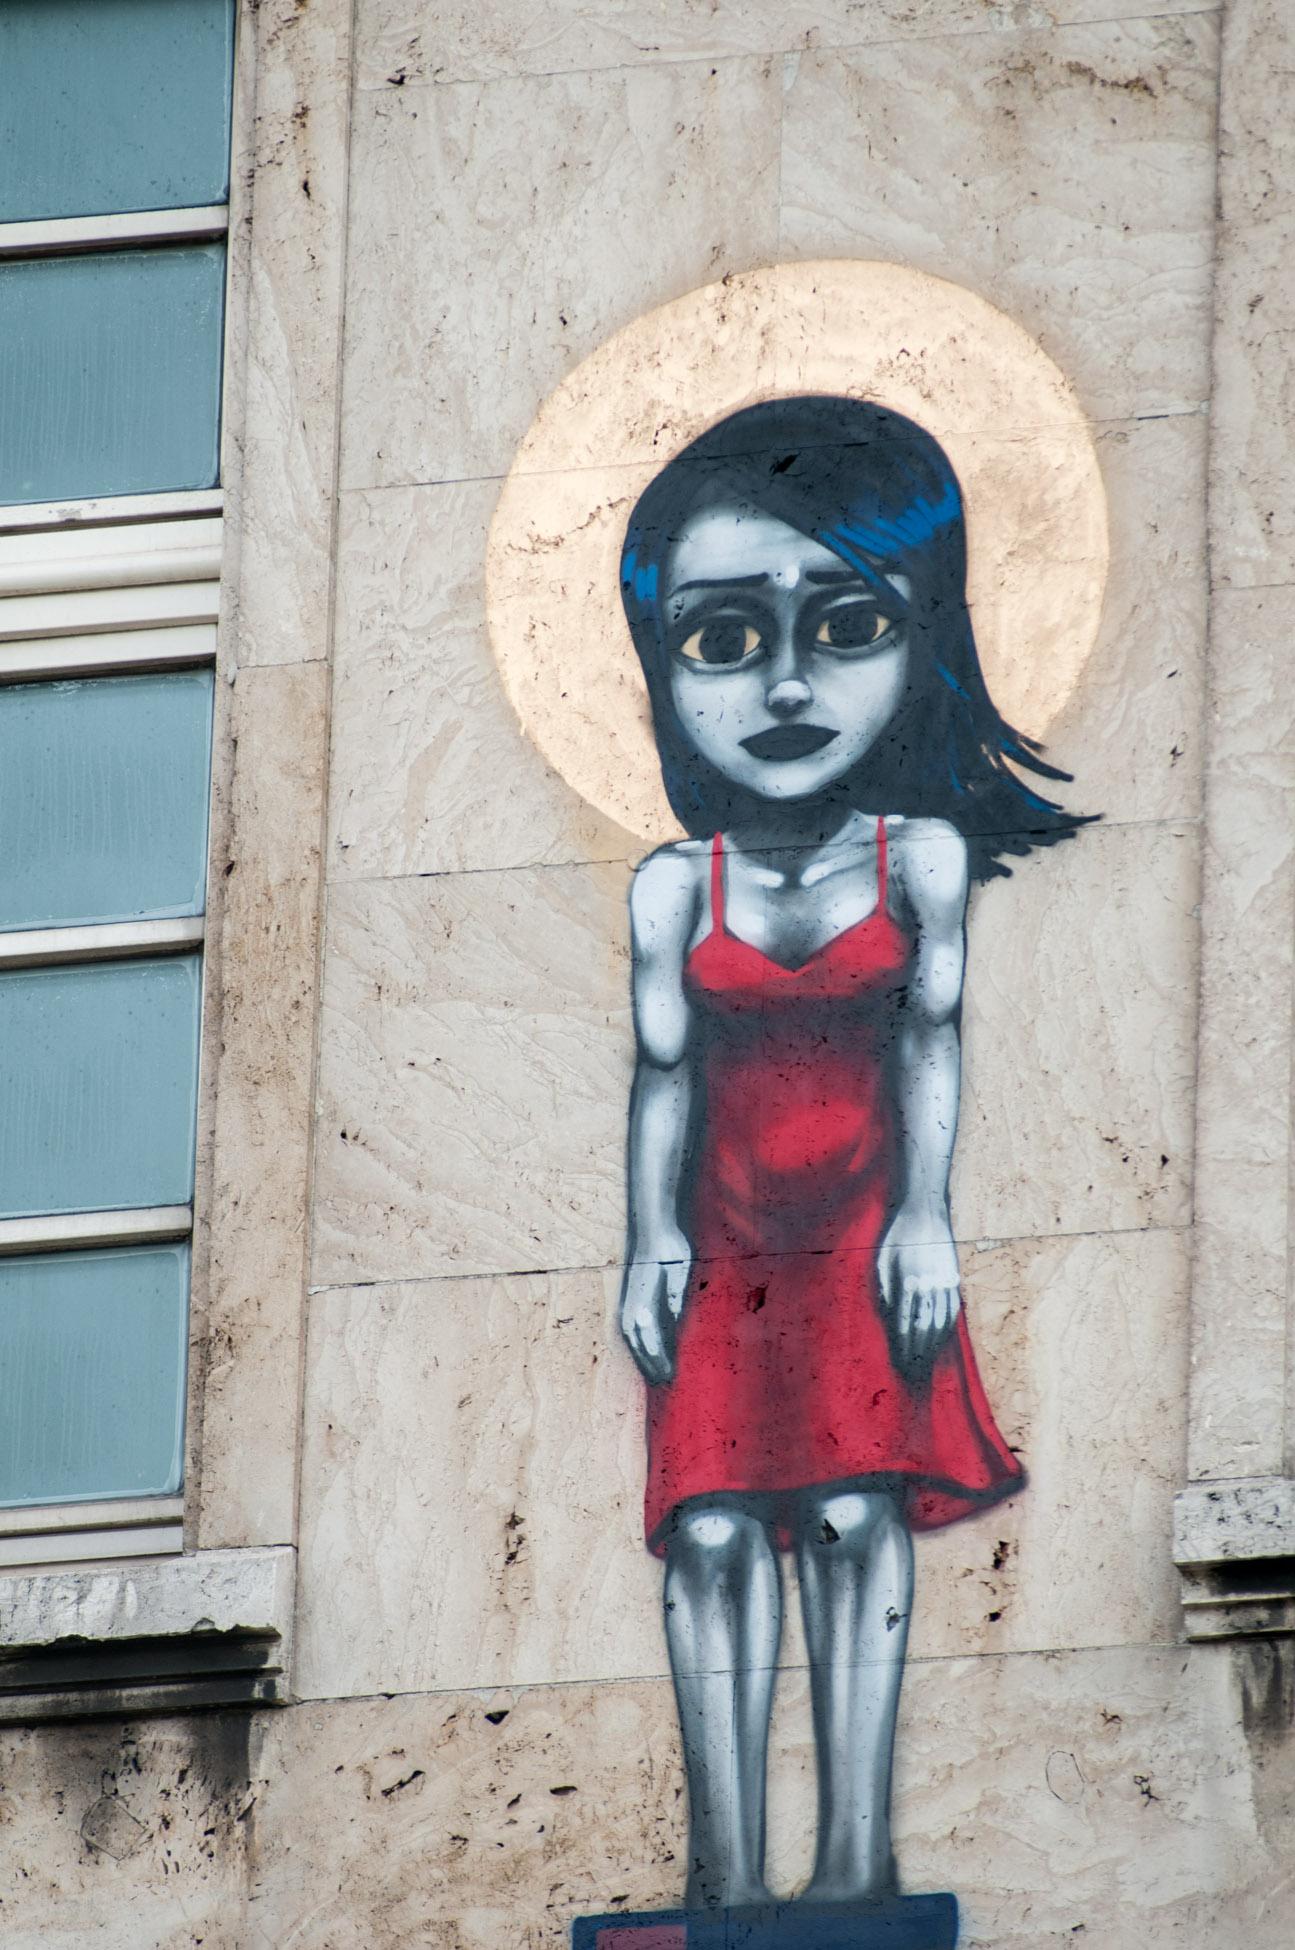 Streetart_Brazil_Tinho_2013_Frankfurt (2 von 6)